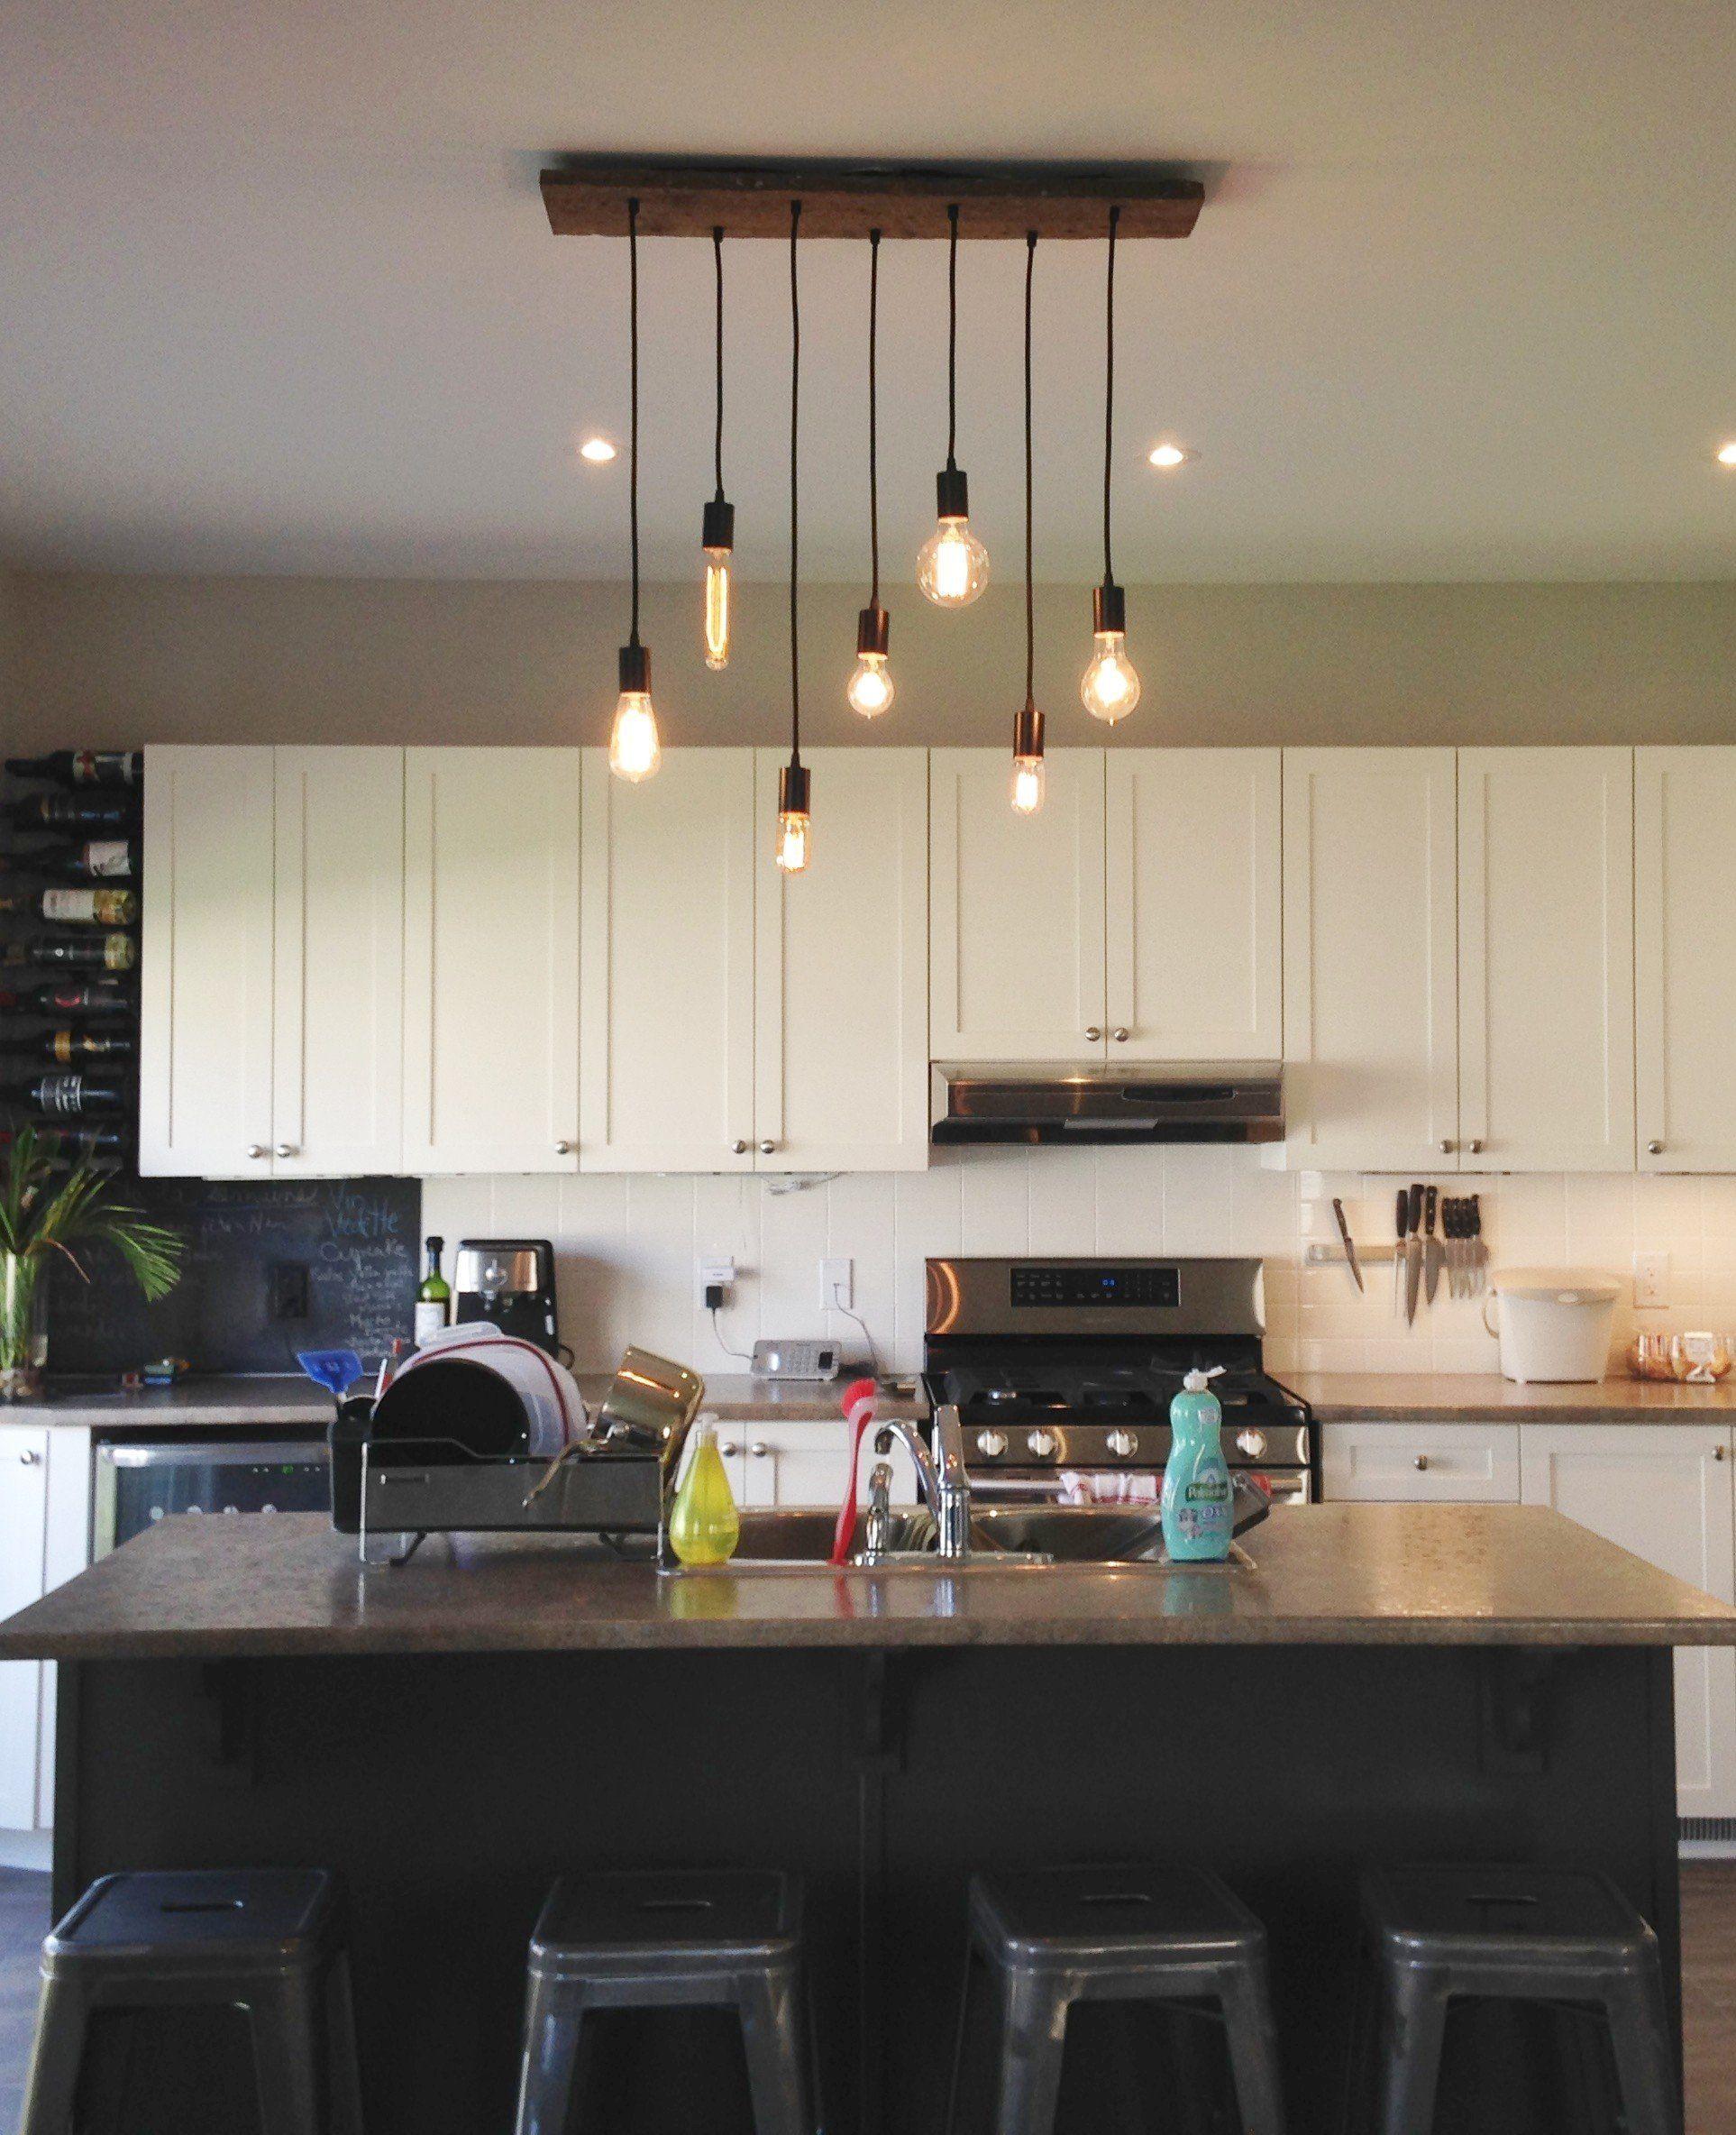 5 Bulb Industrial Pipe Manifold Chandelier | Küchenbeleuchtung ...